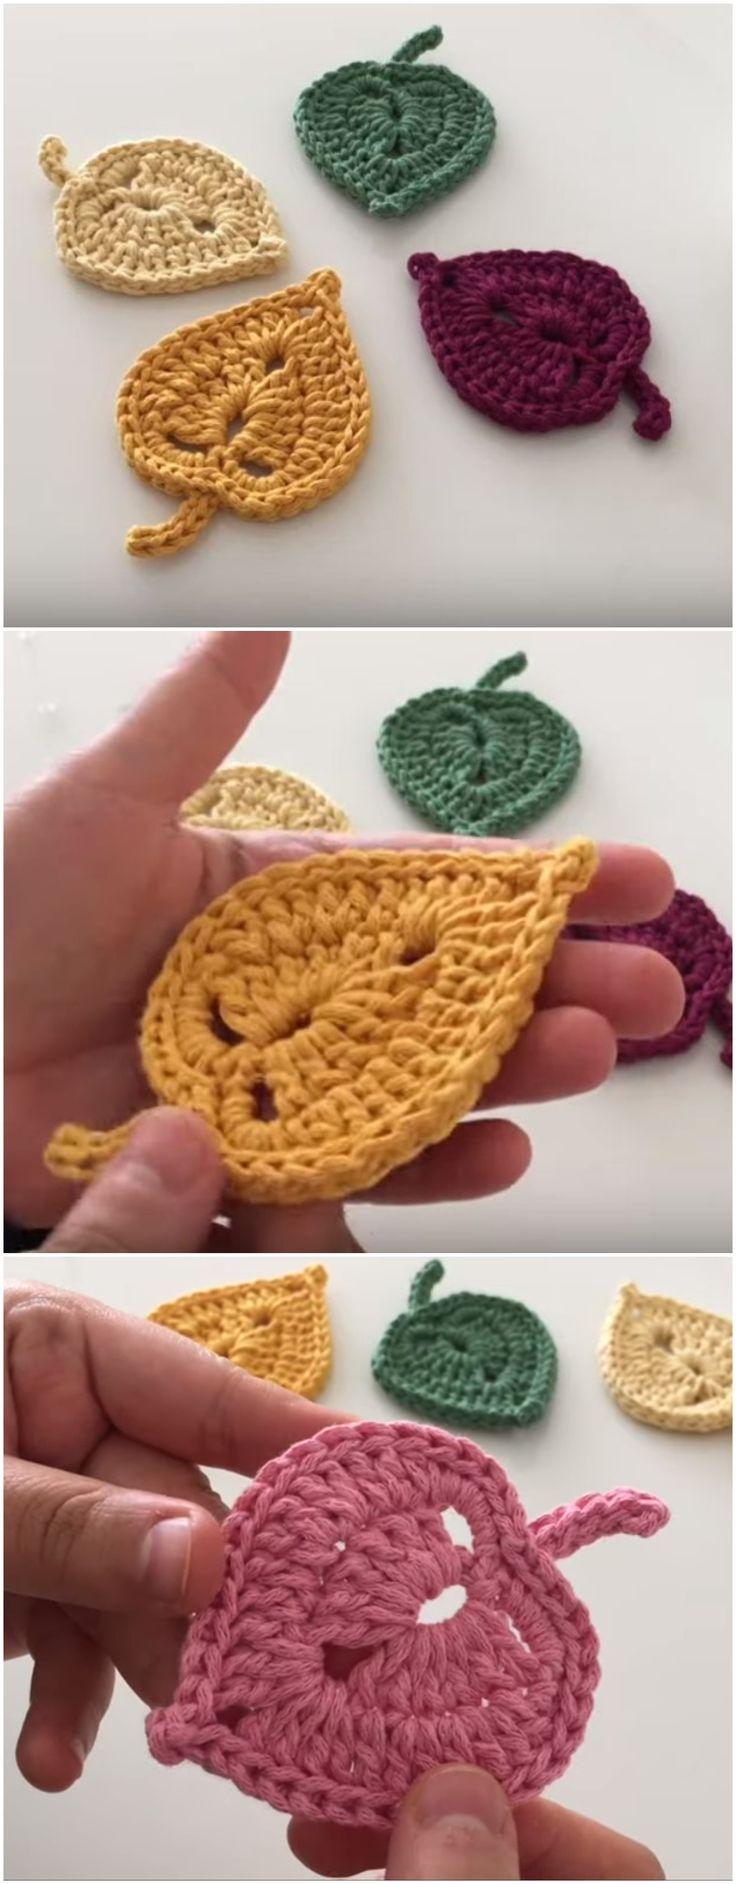 Crochet Tiny Leaves Video Tutorial